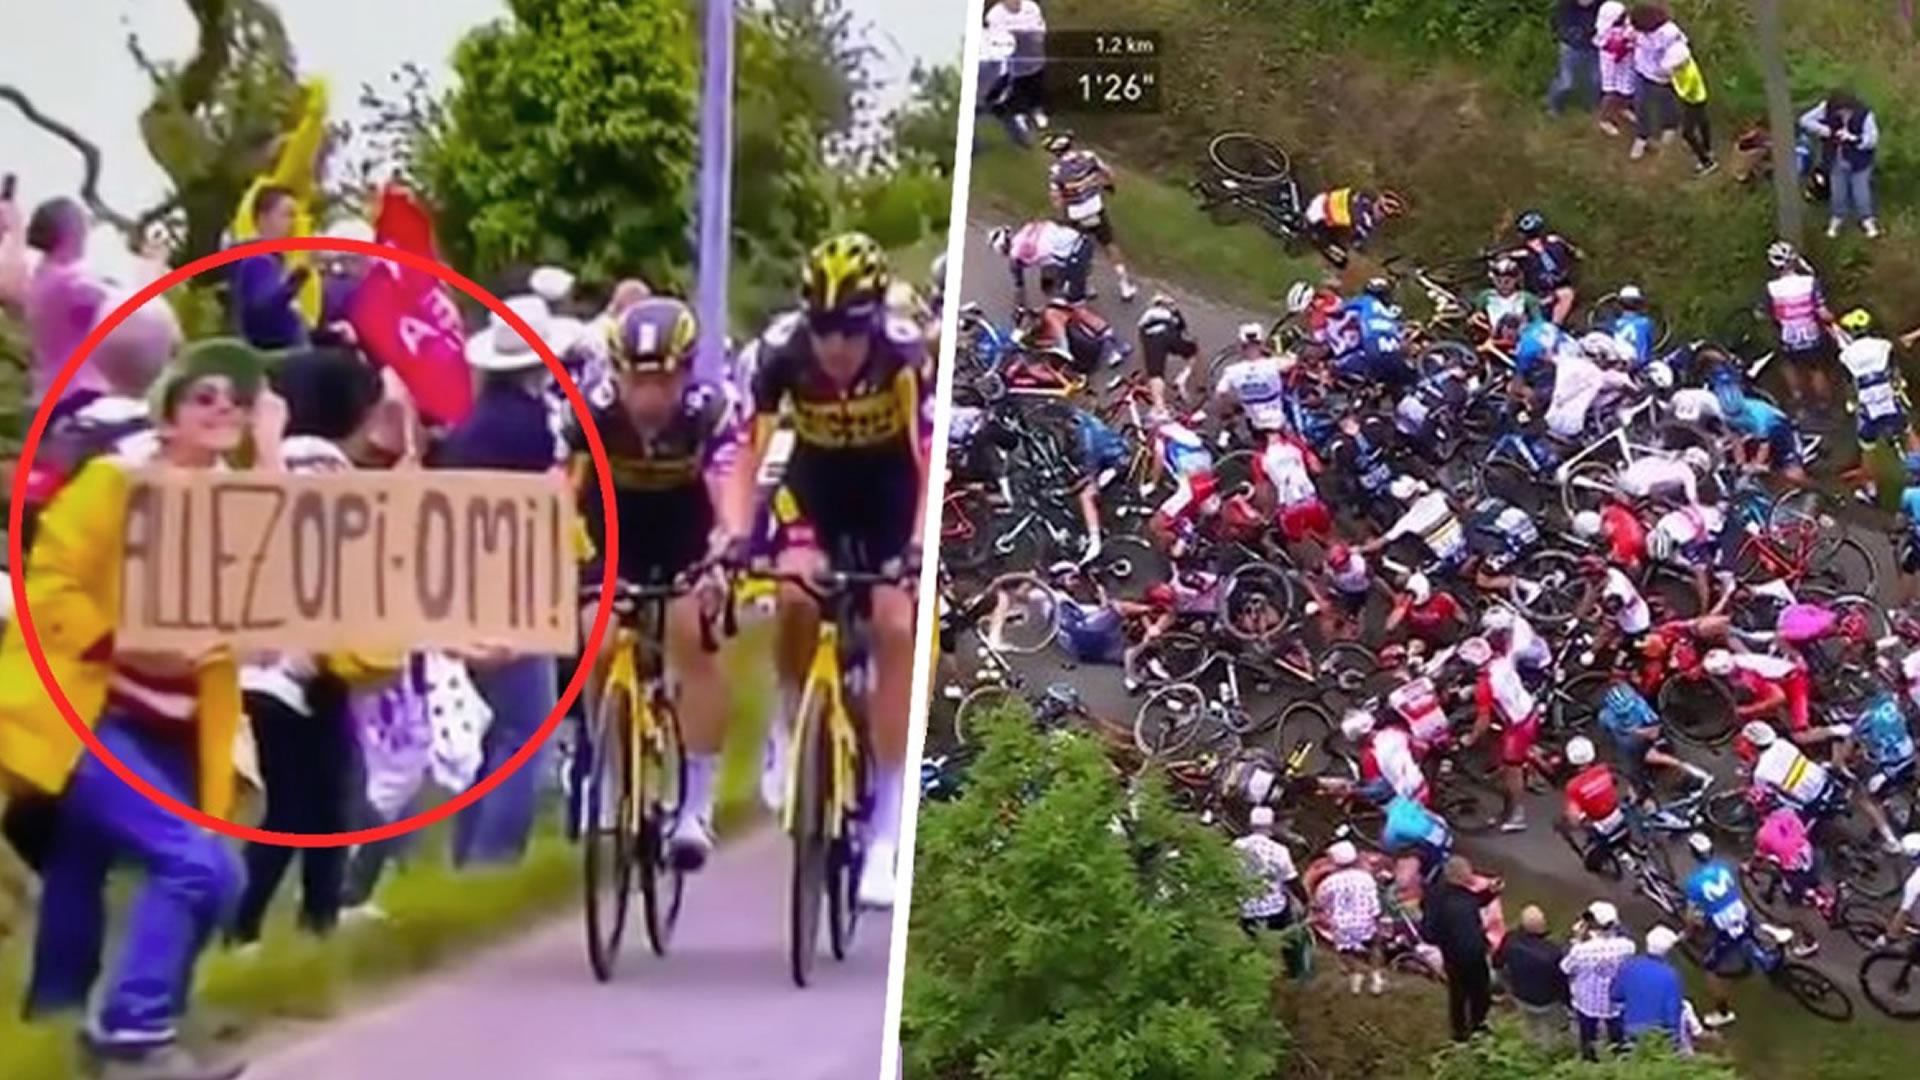 VIDEO: Un aficionado provoca terrible caída masiva en el Tour de Francia